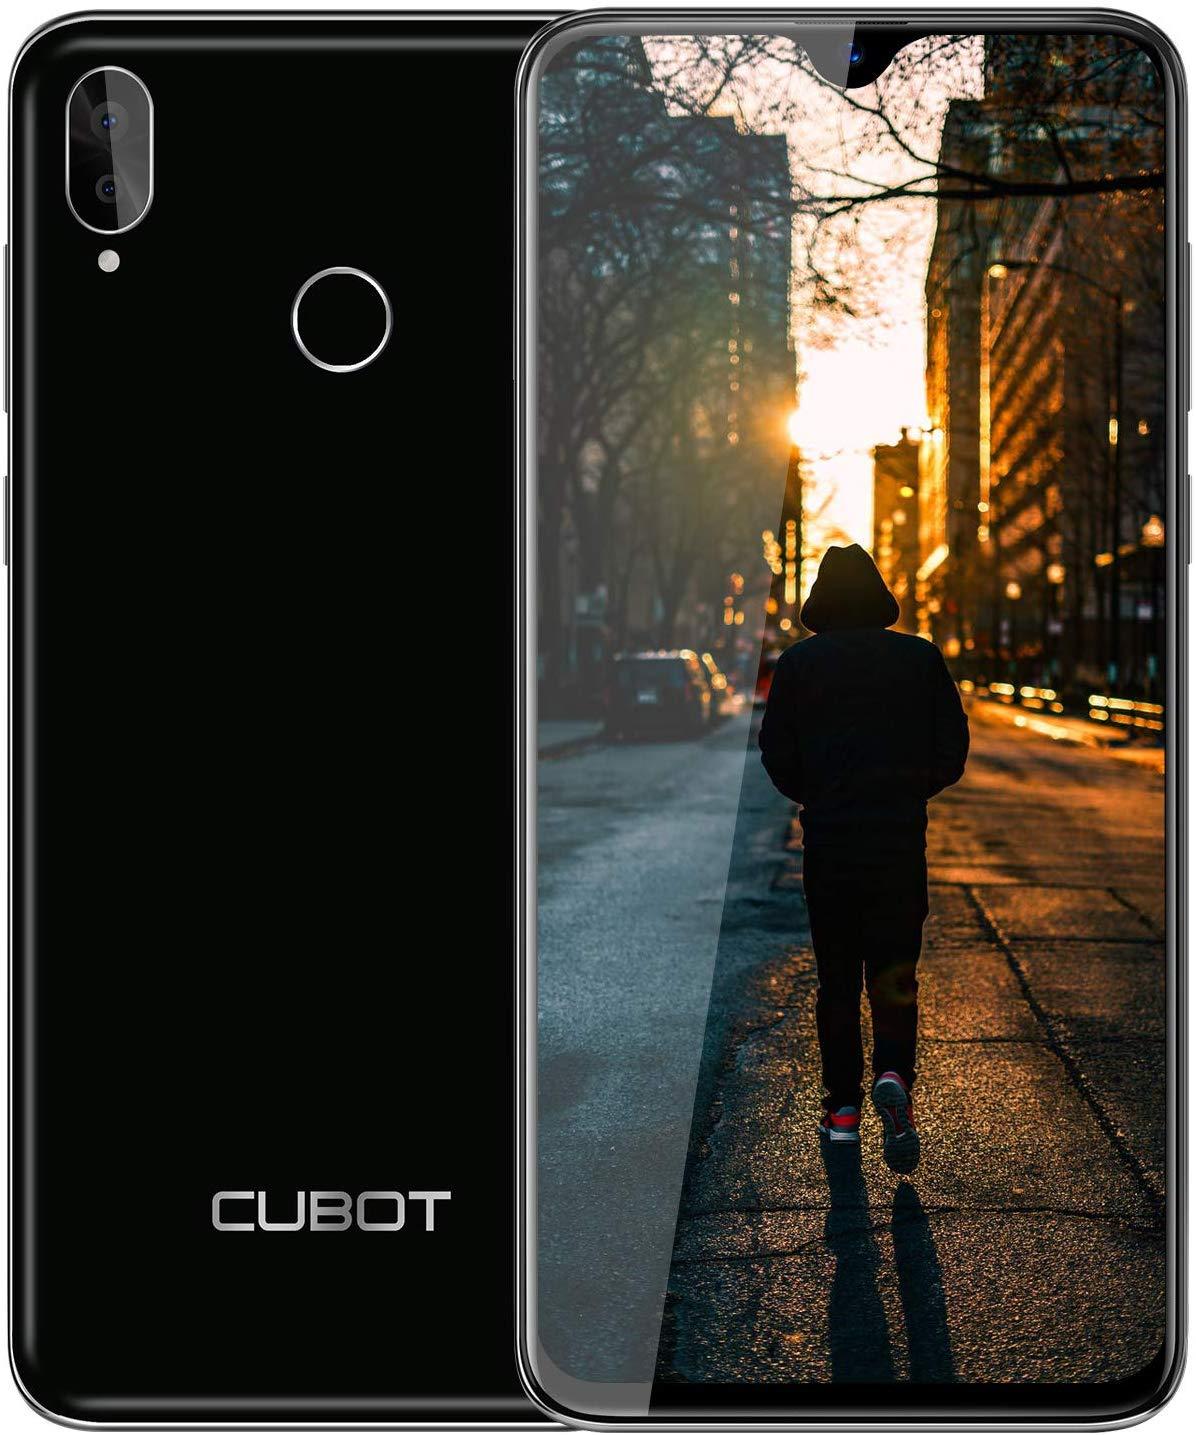 Comprar Cabot R15 Pro